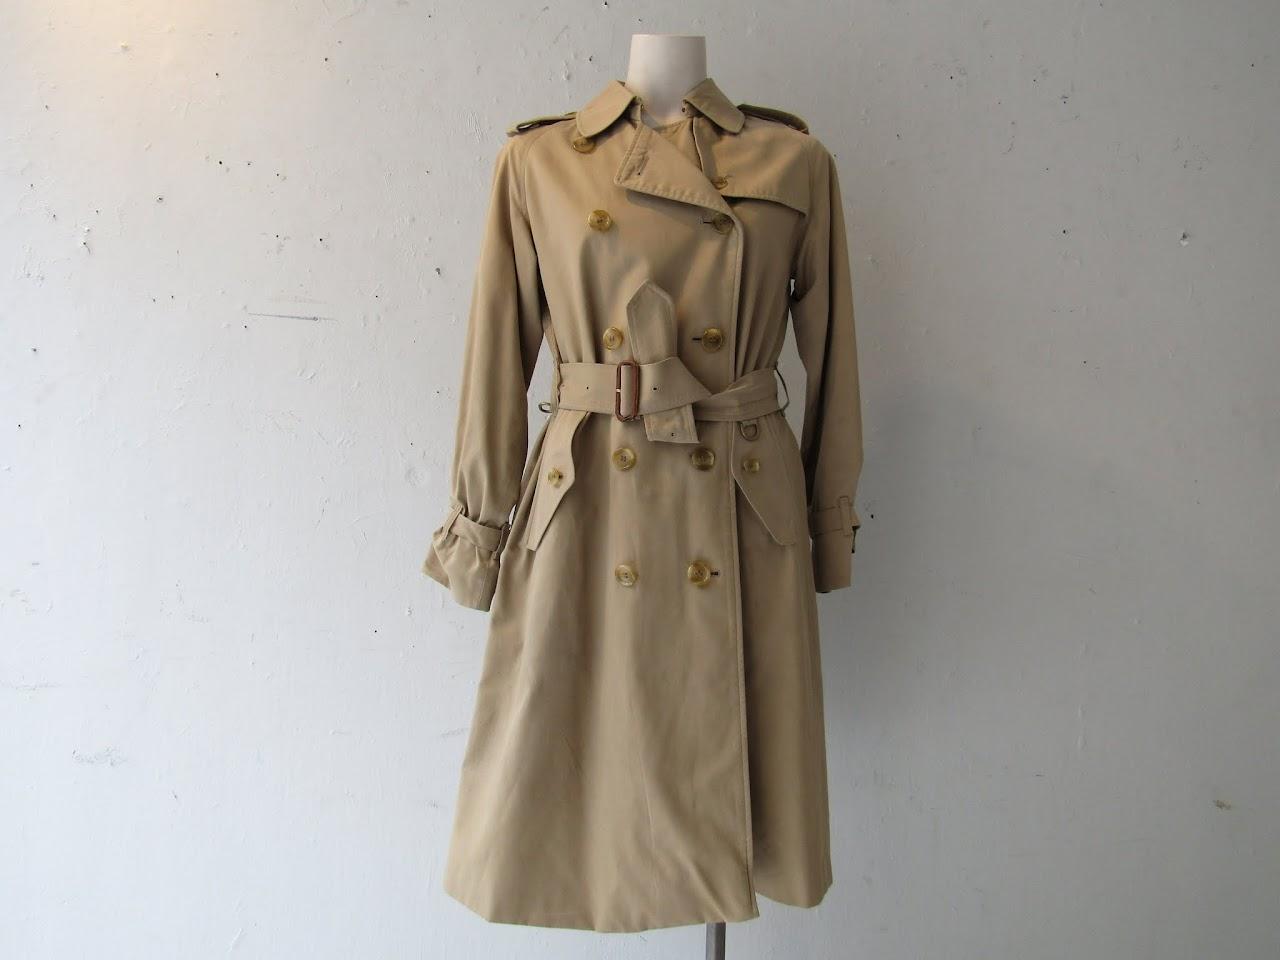 Burberry's Classic Tan Trenchcoat